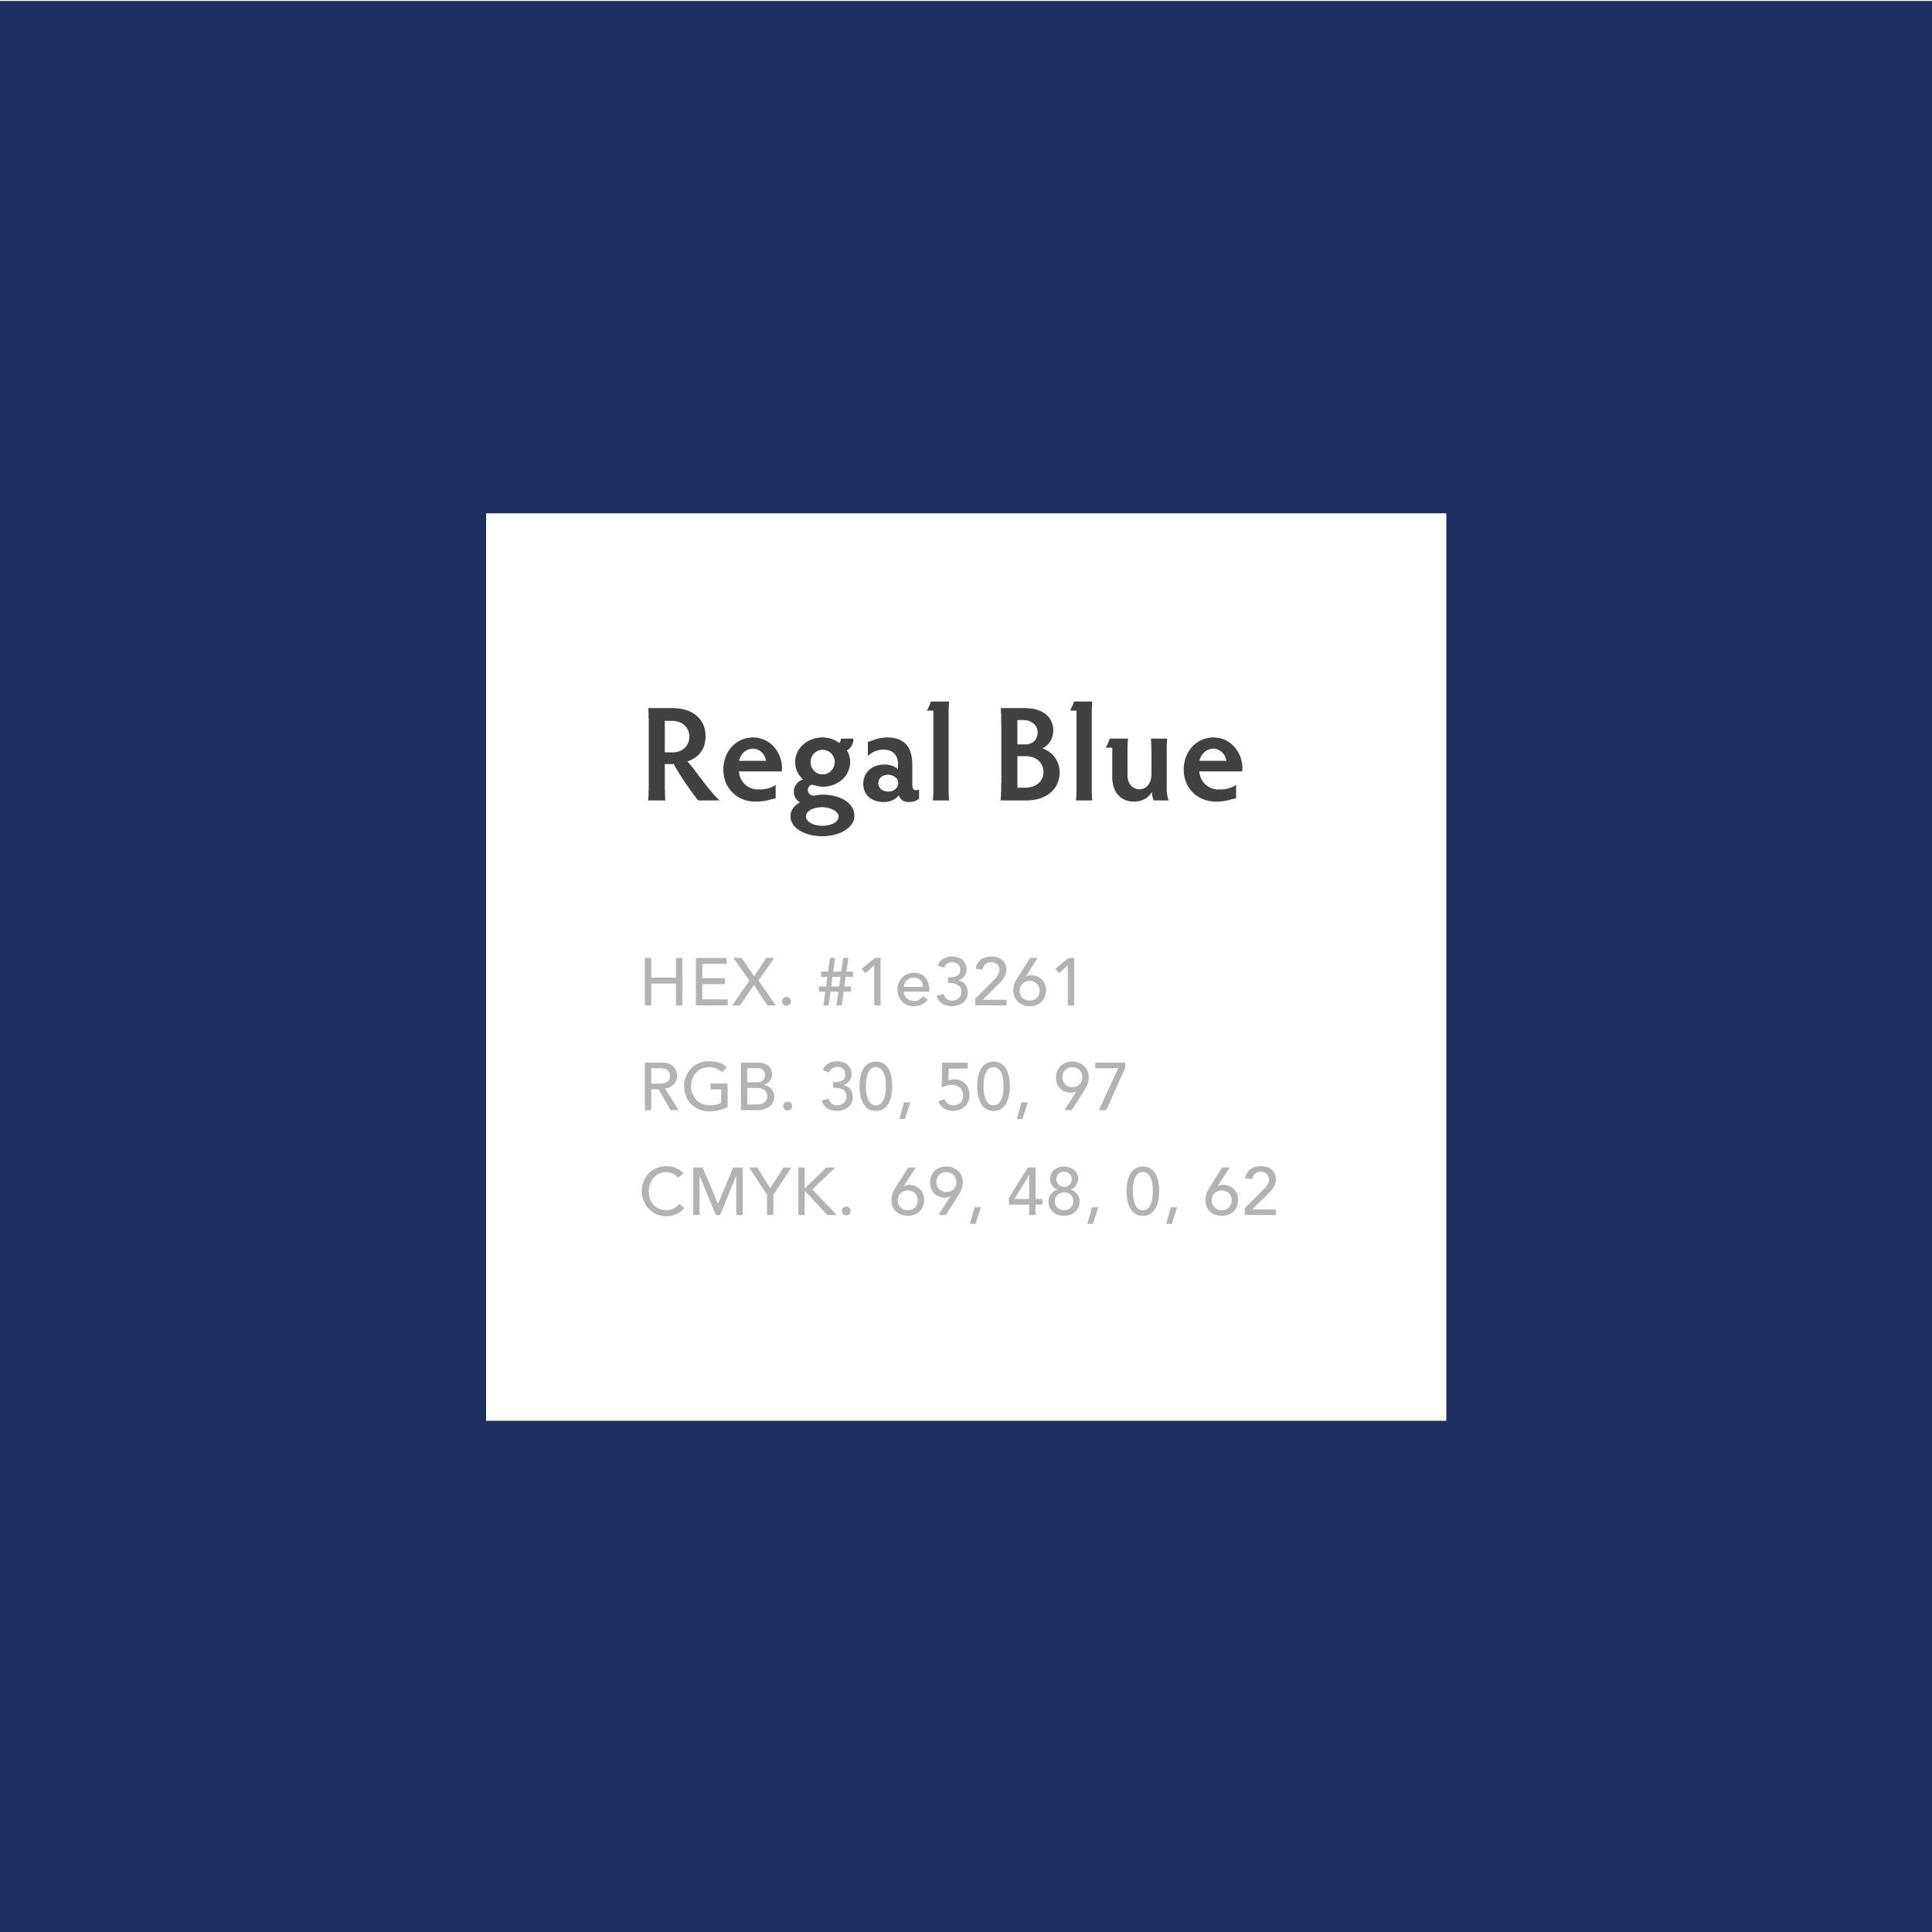 regal_blue.png